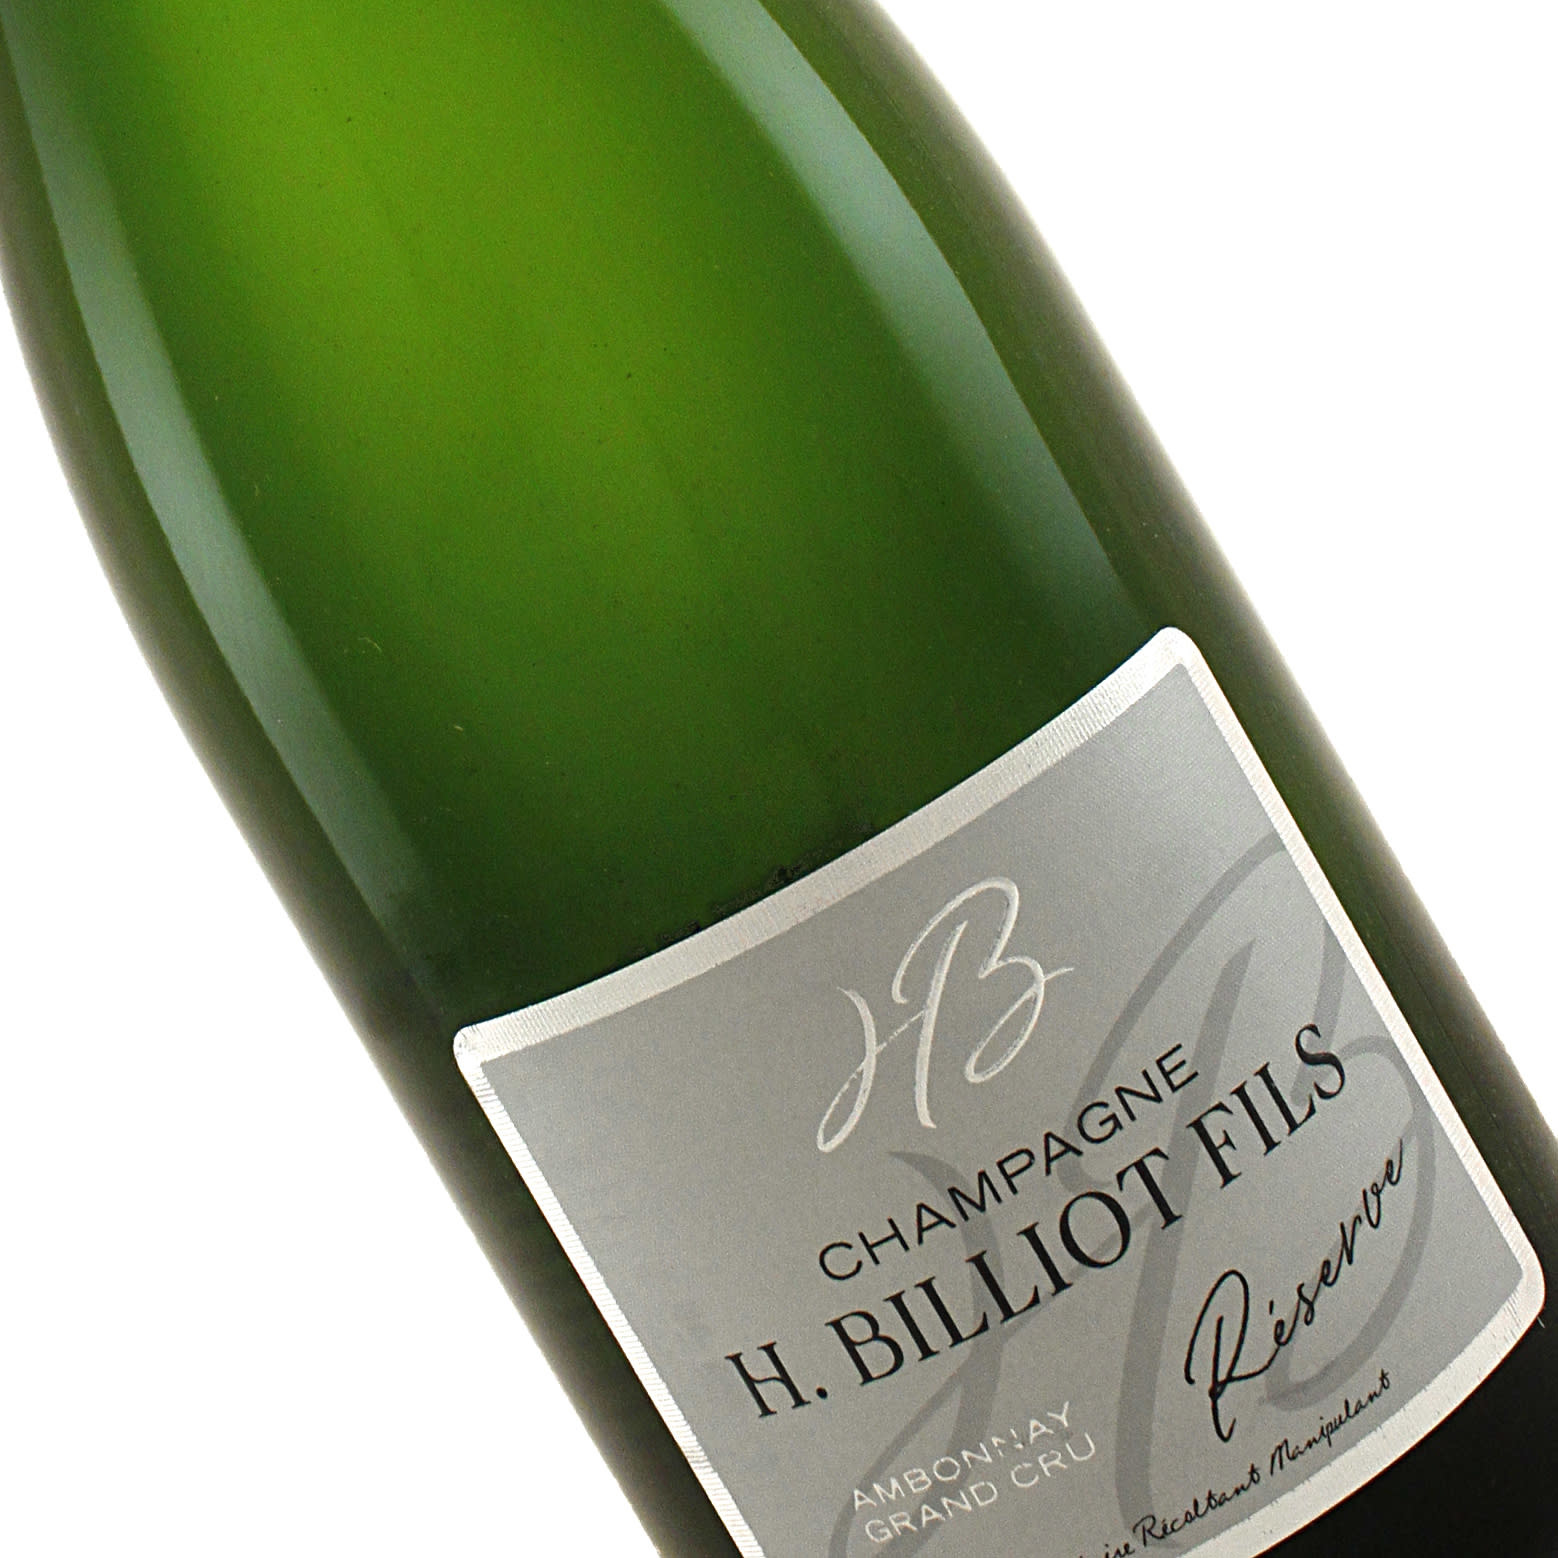 H. Billiot Fils N.V. Champagne Grand Cru Brut Reserve, Magnum